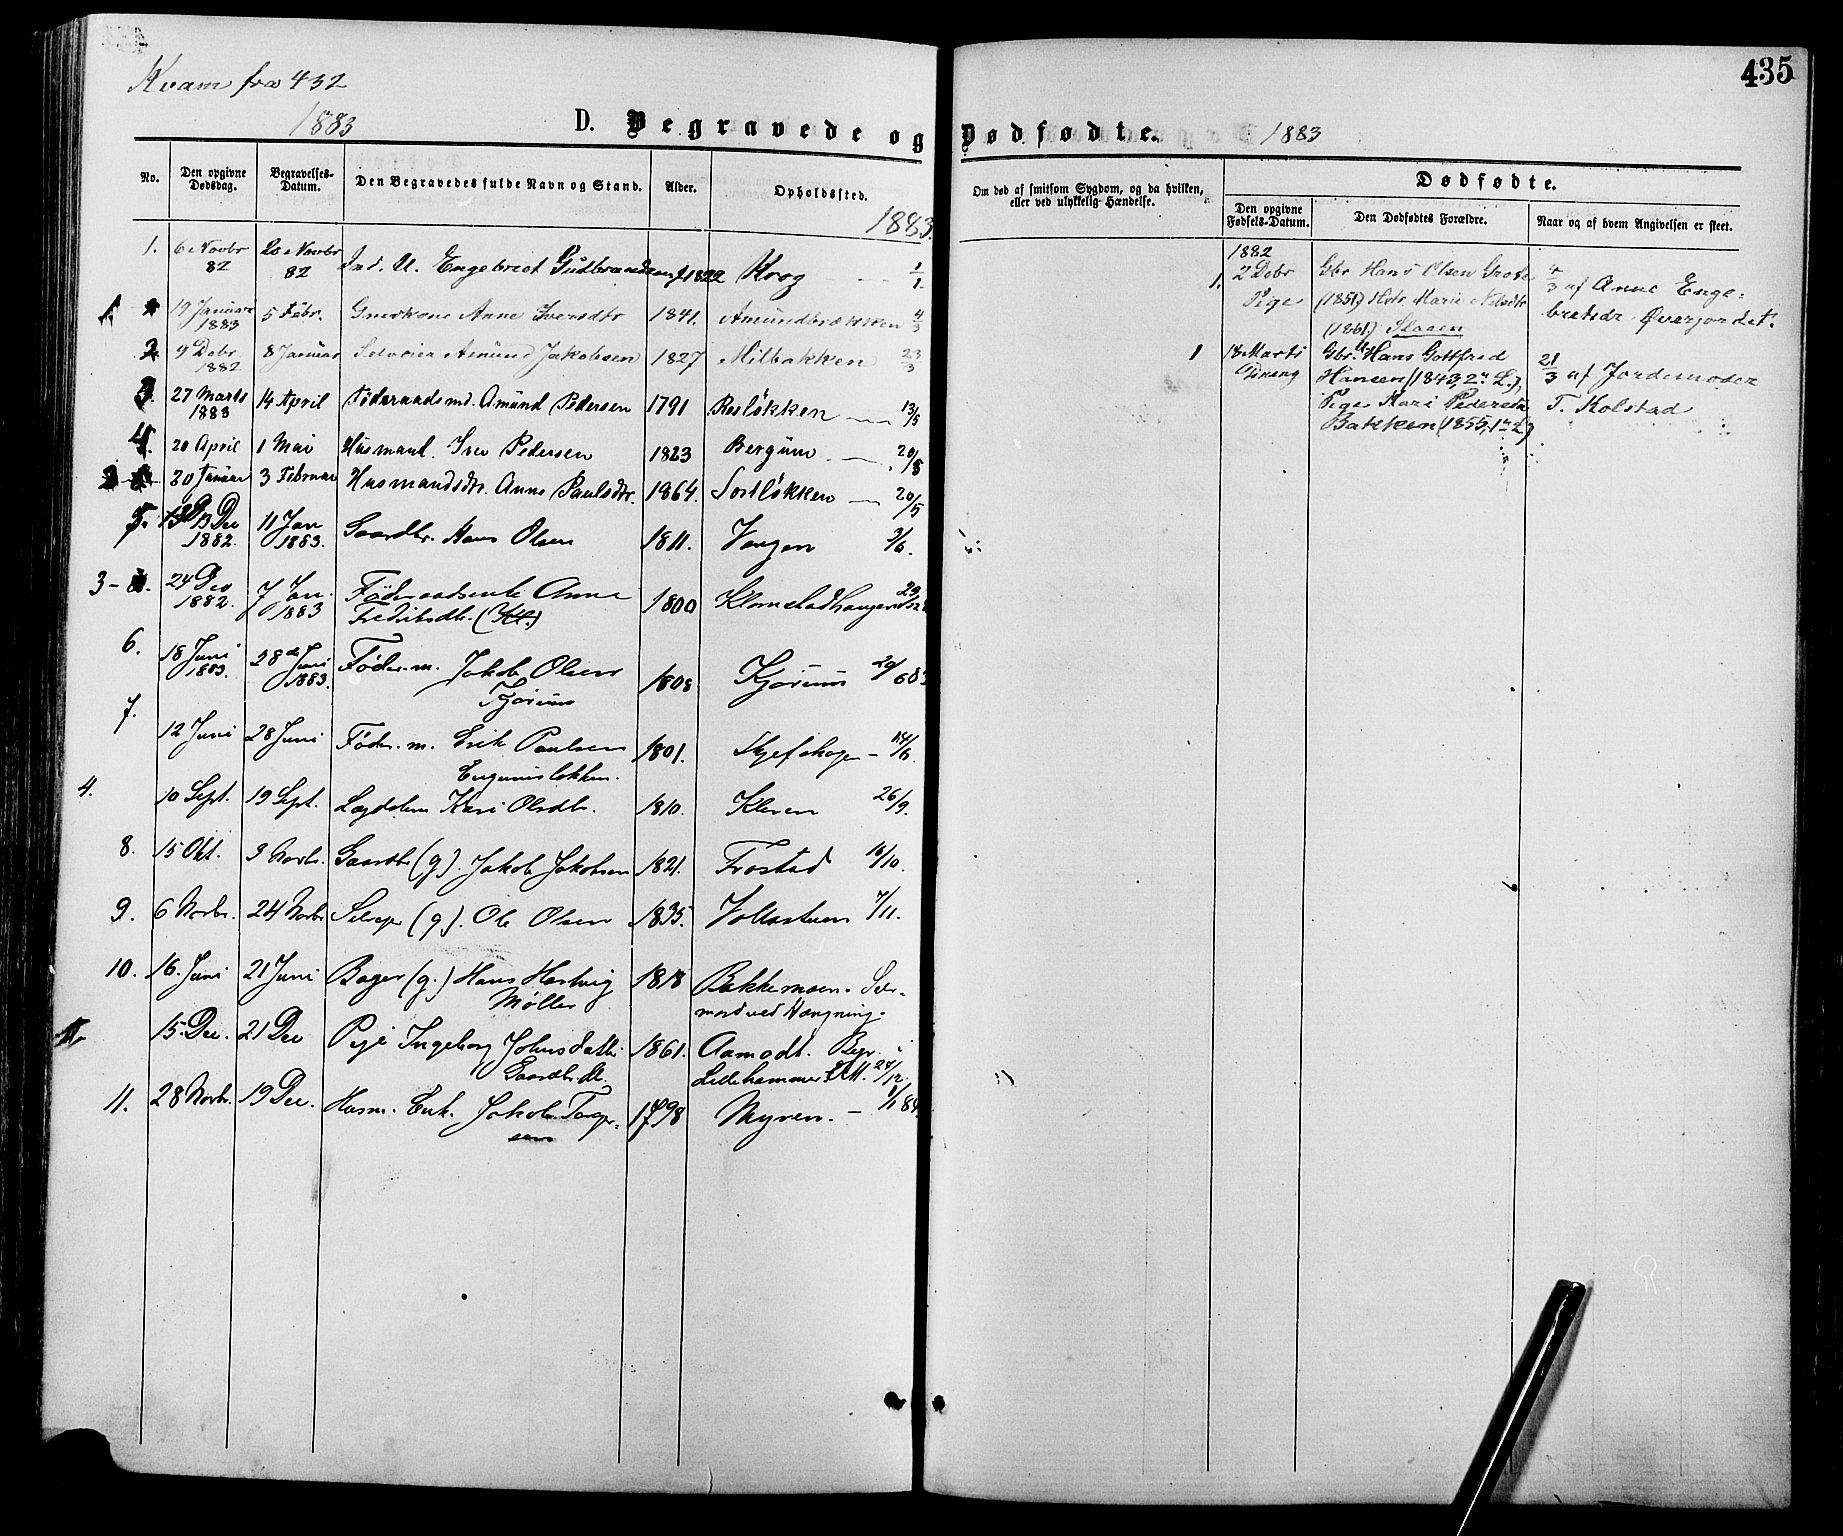 SAH, Nord-Fron prestekontor, Ministerialbok nr. 2, 1865-1883, s. 435